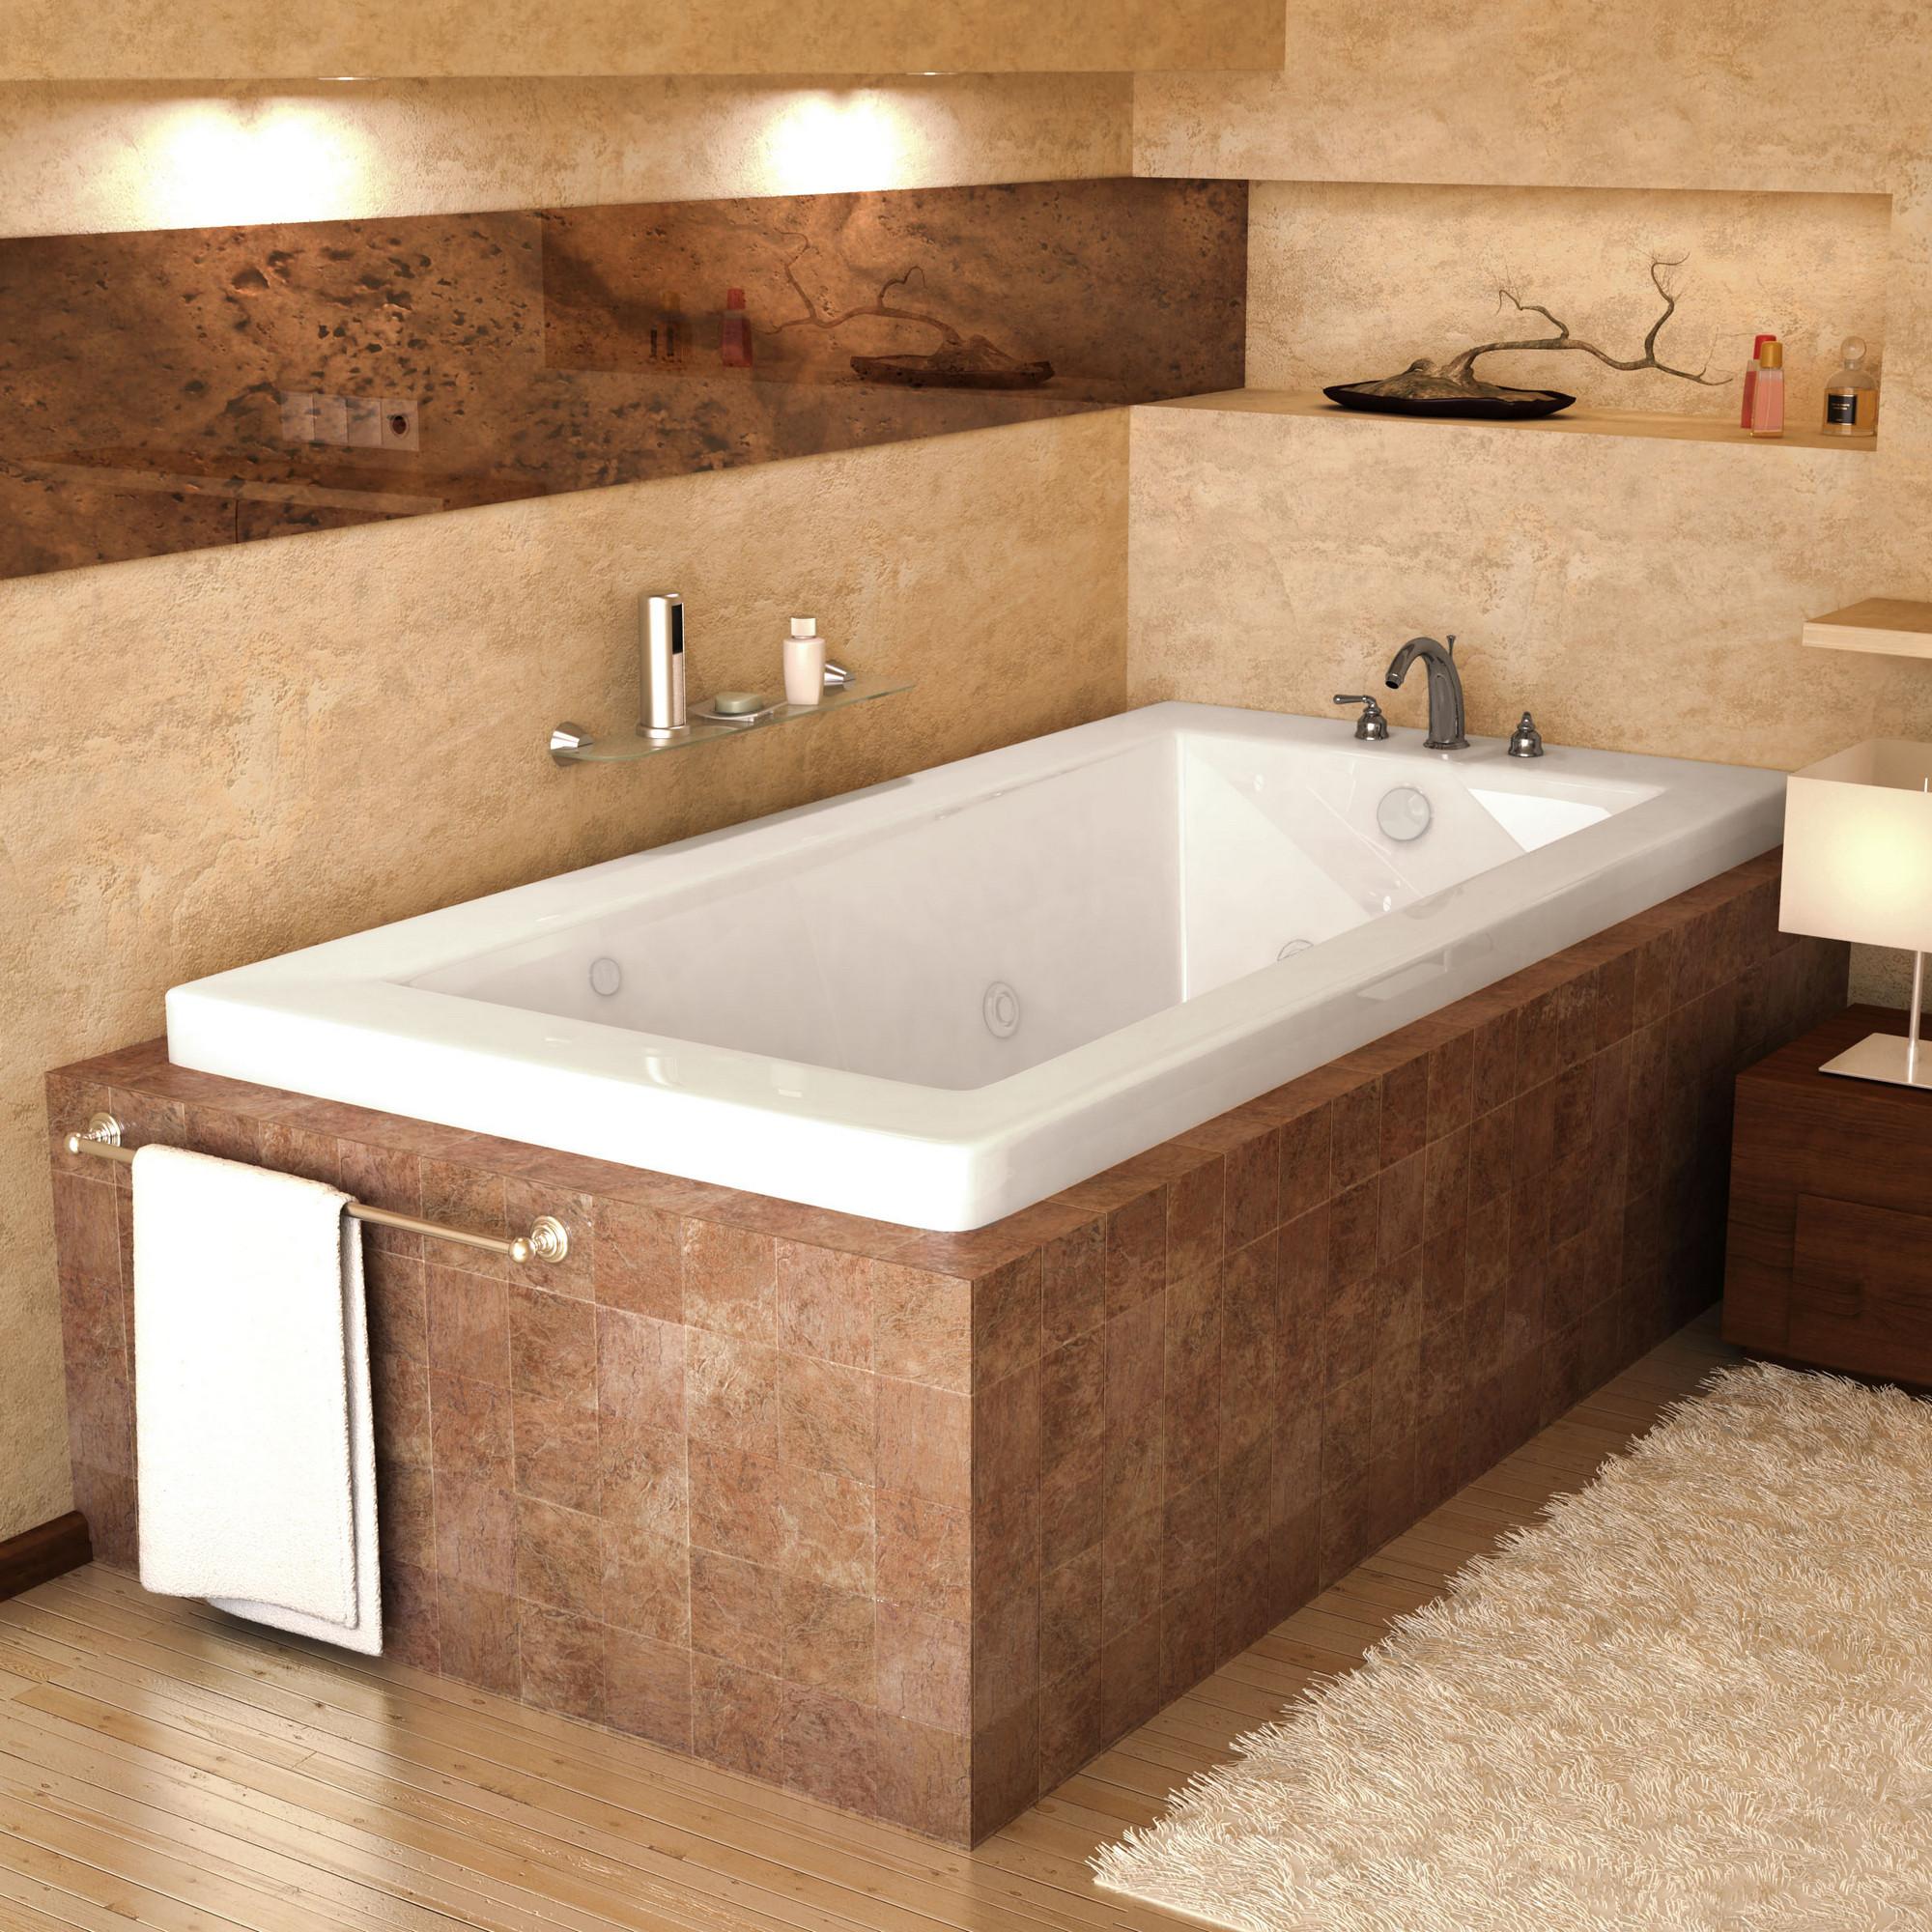 MediTub 3272VNDL Atlantis Venetian Air & Whirlpool Bathtub With Left Drain